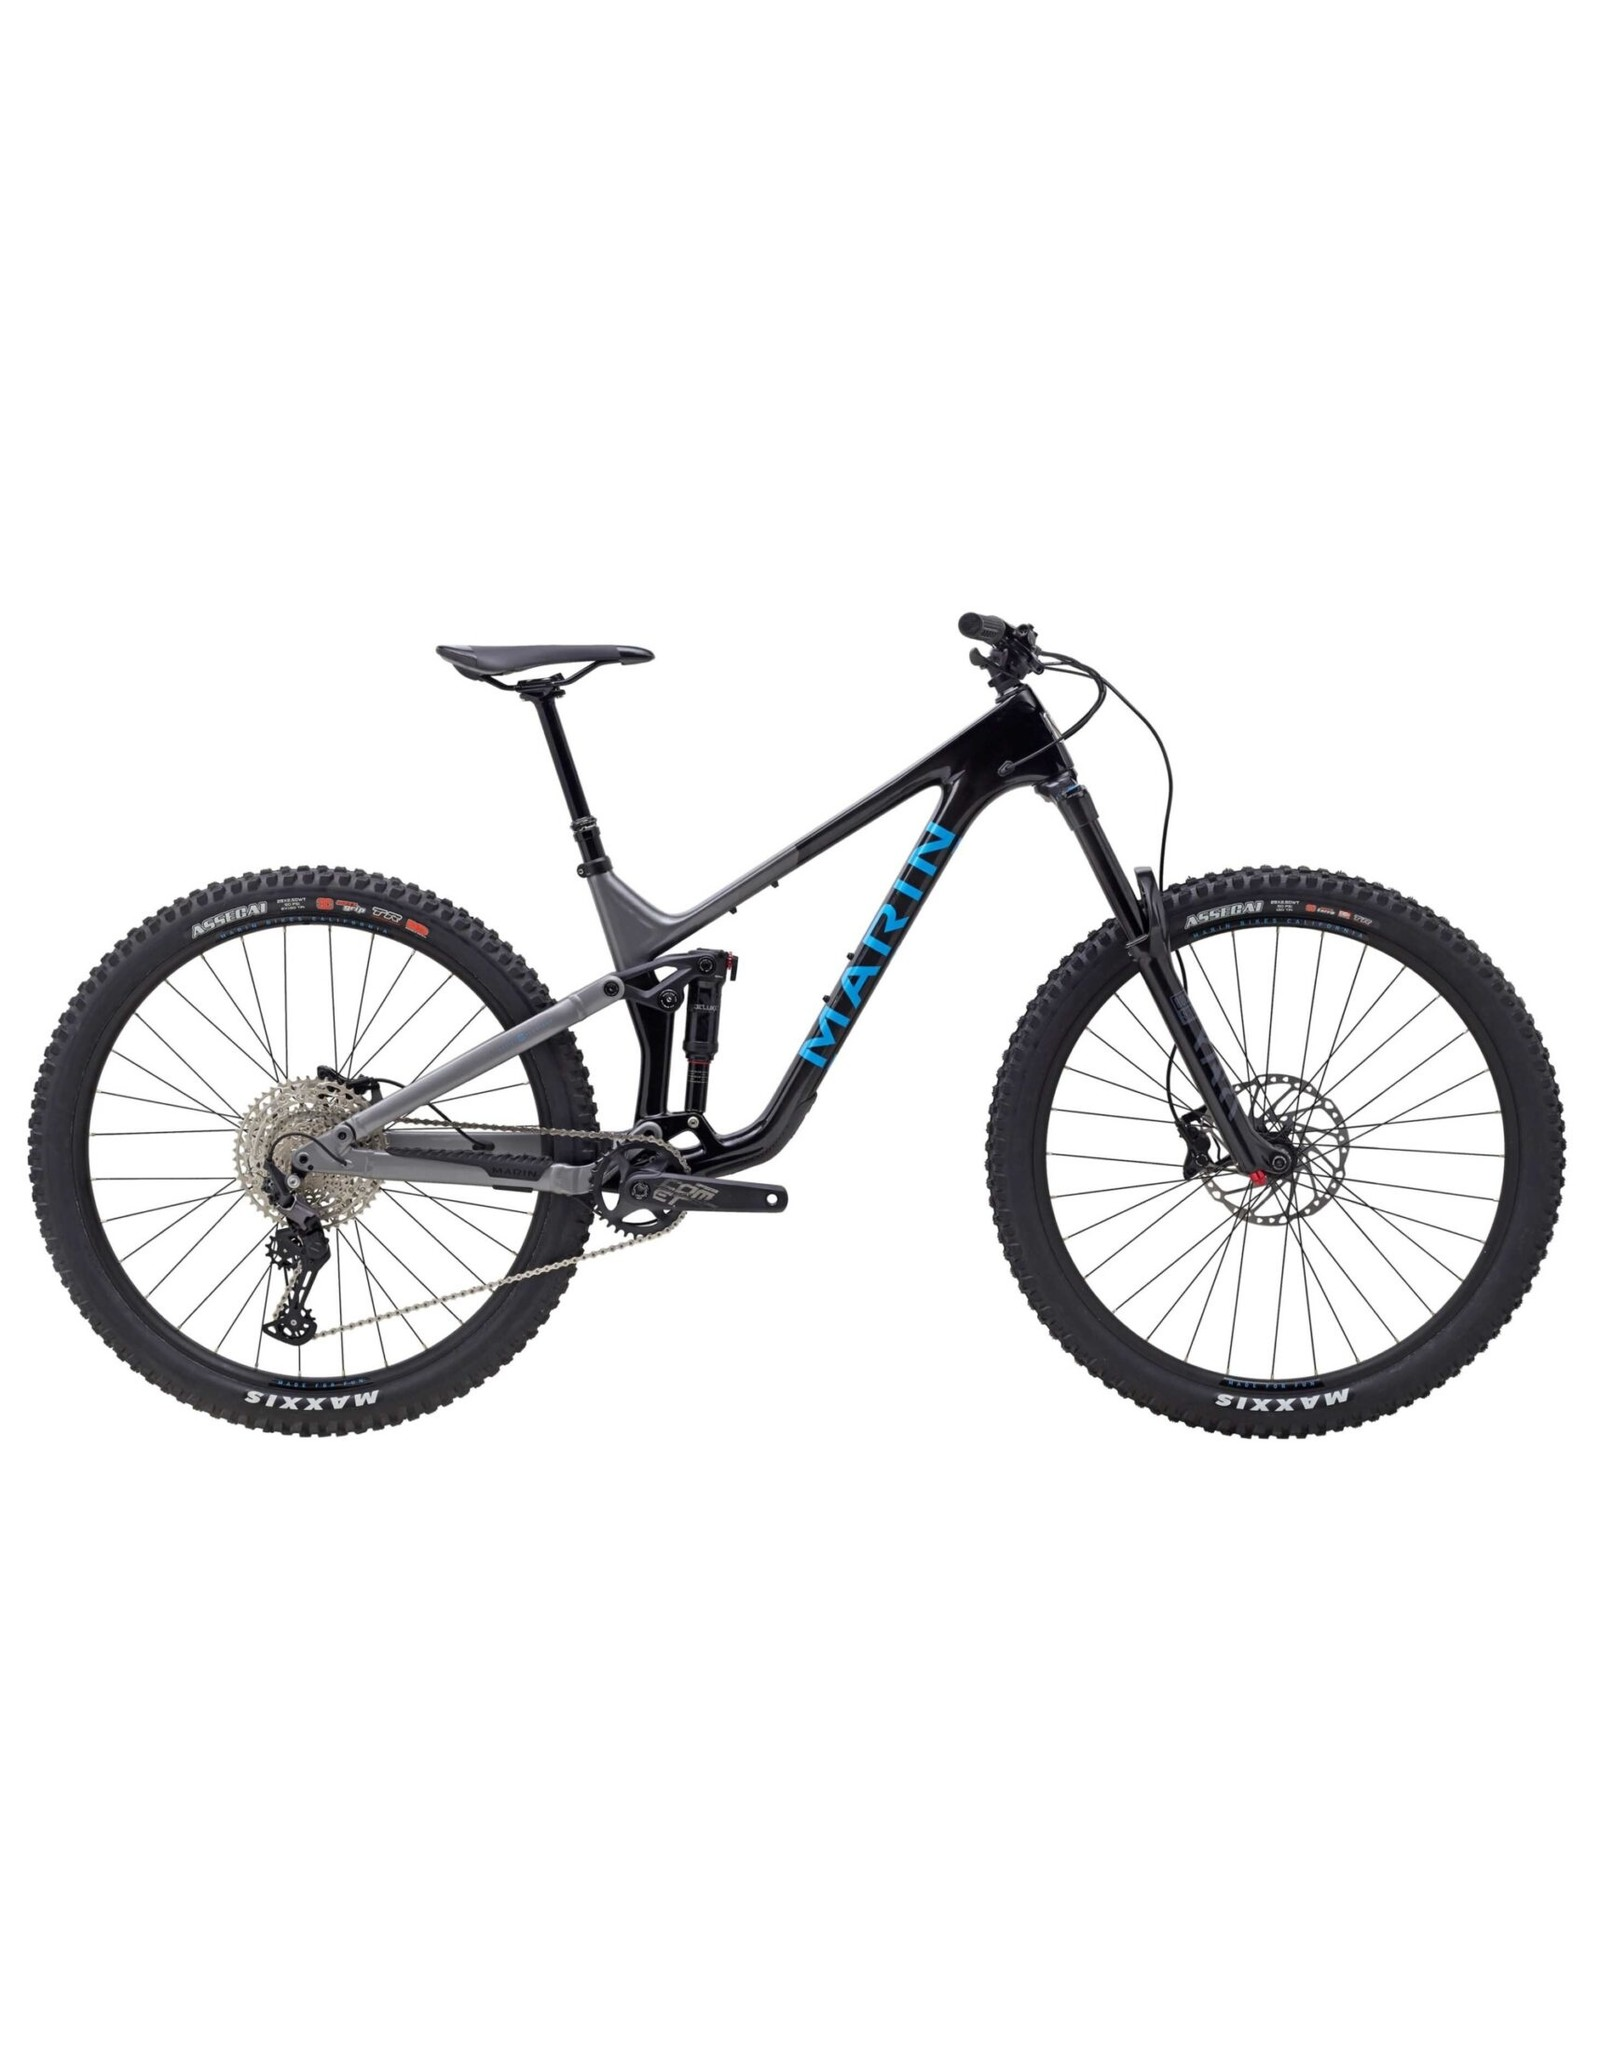 MARIN 2021 Alpine Trail C1